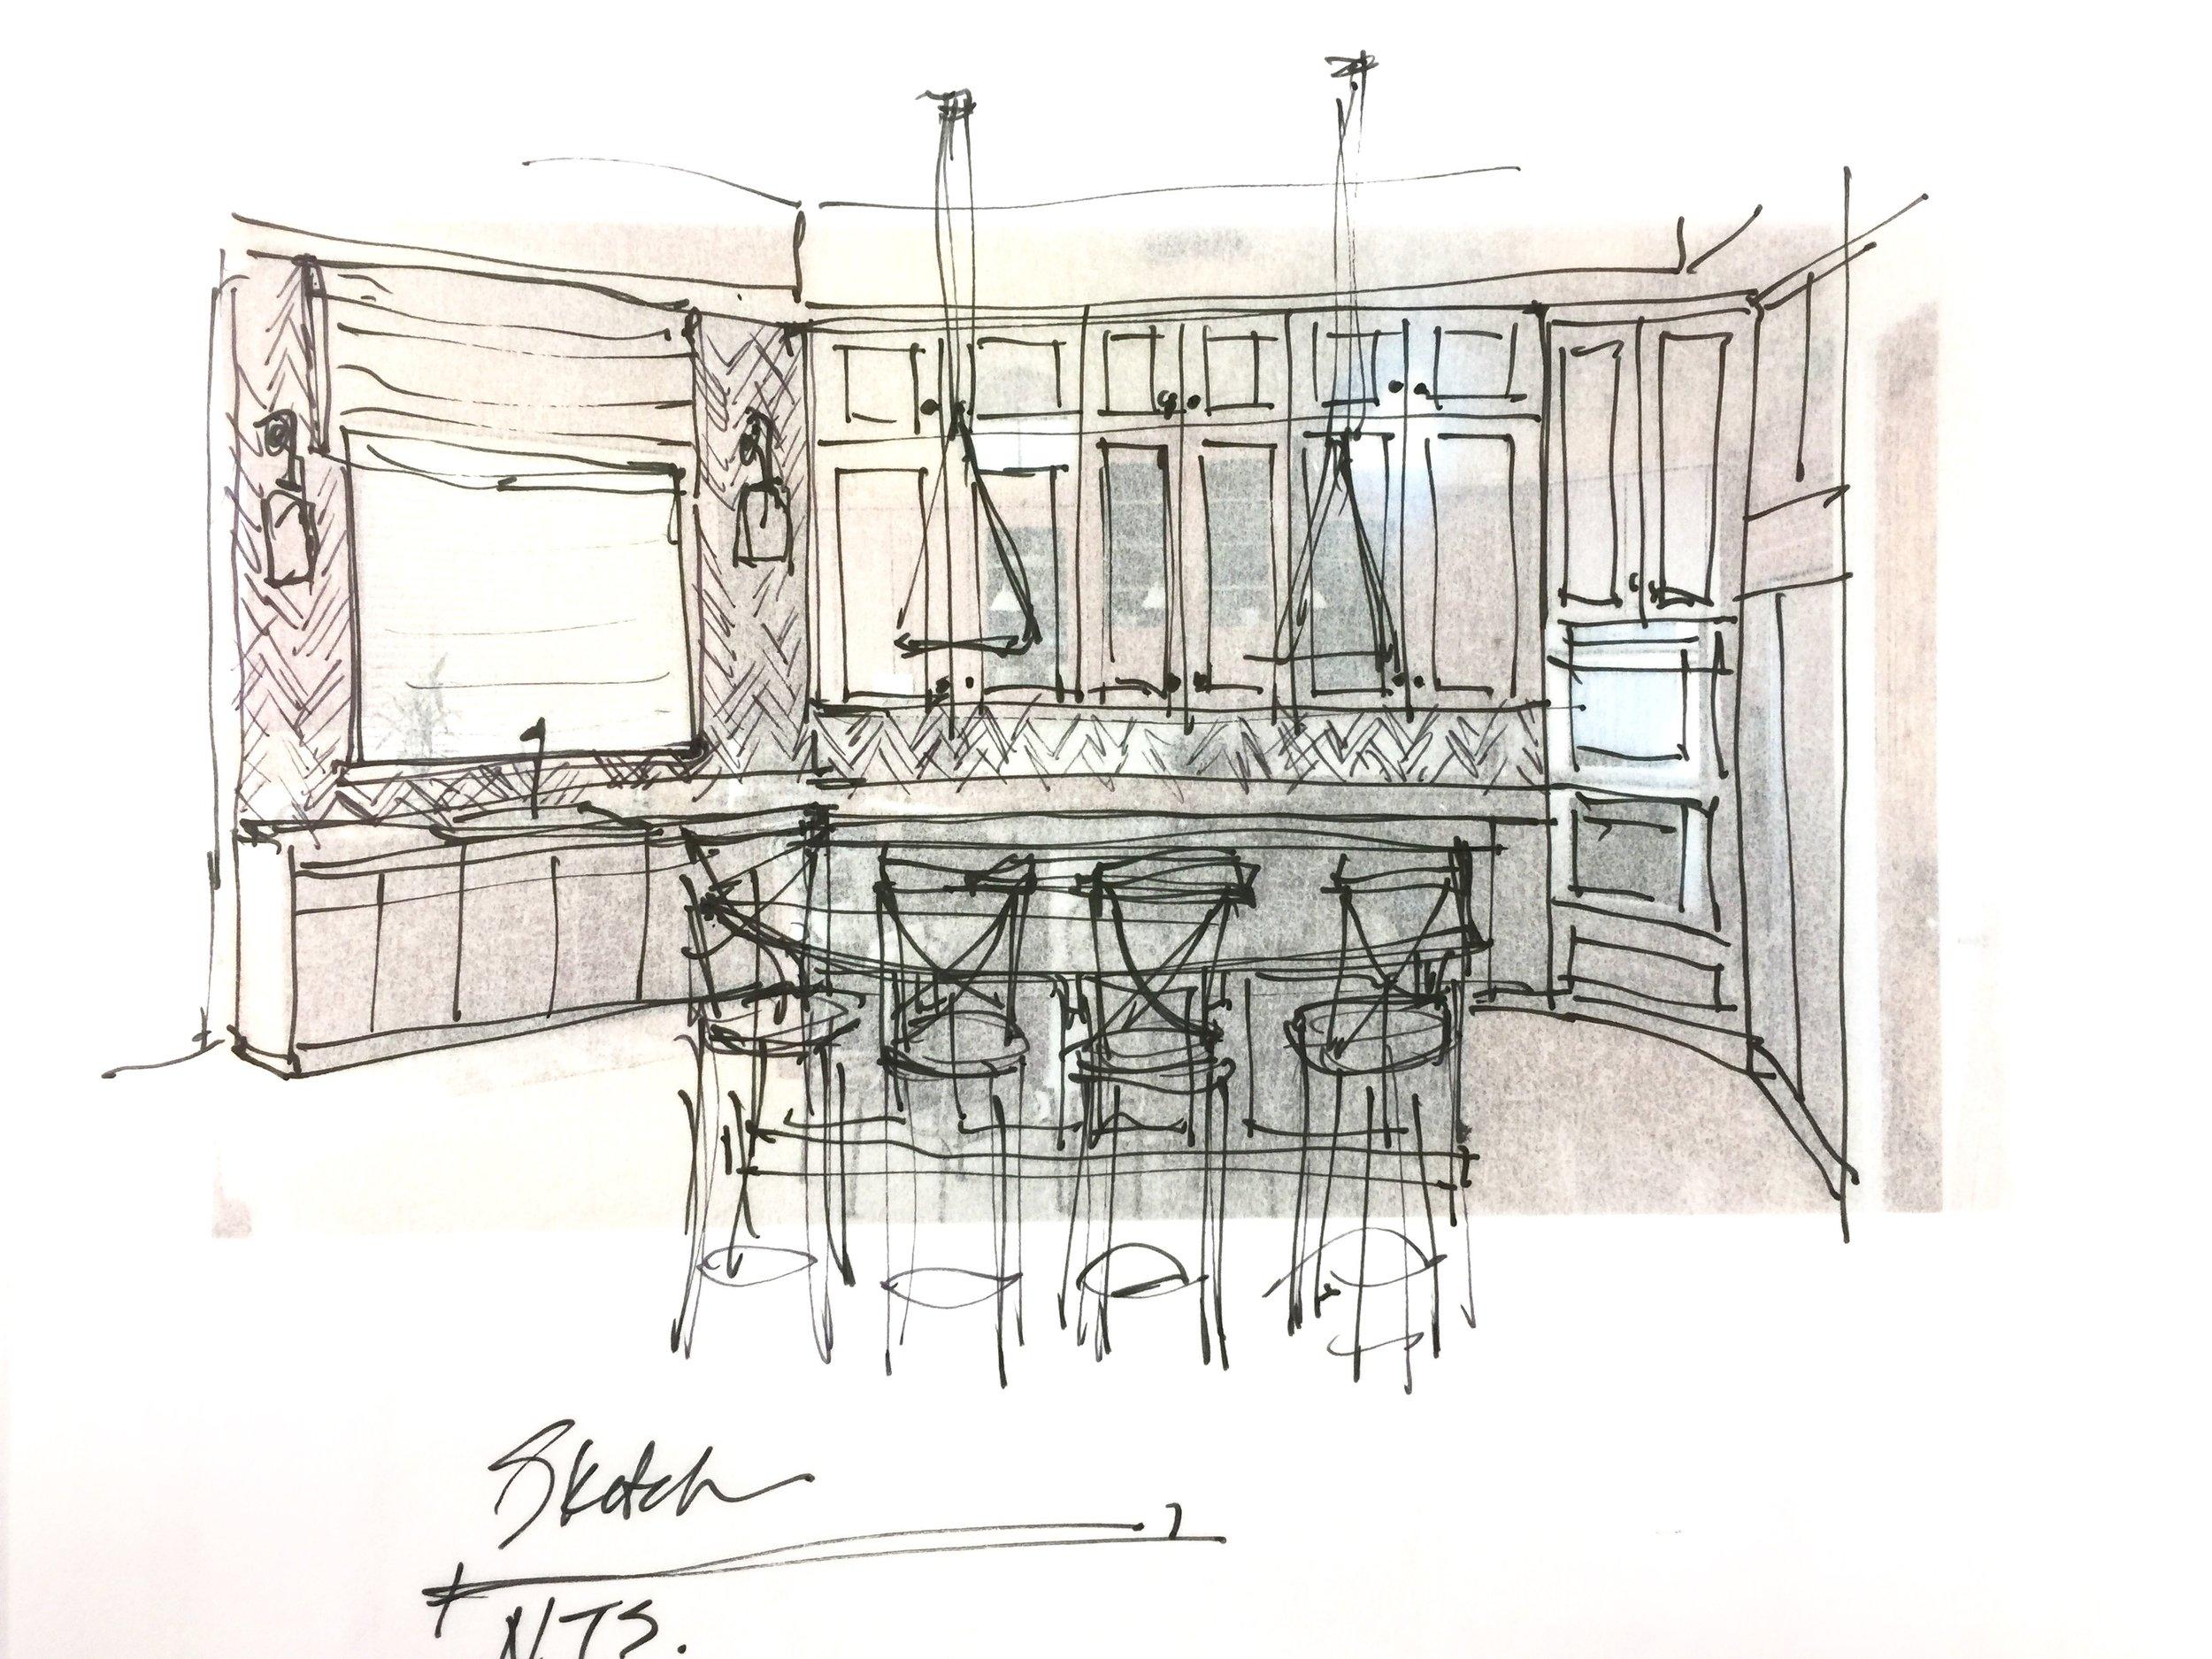 Kitchen remodel sketch